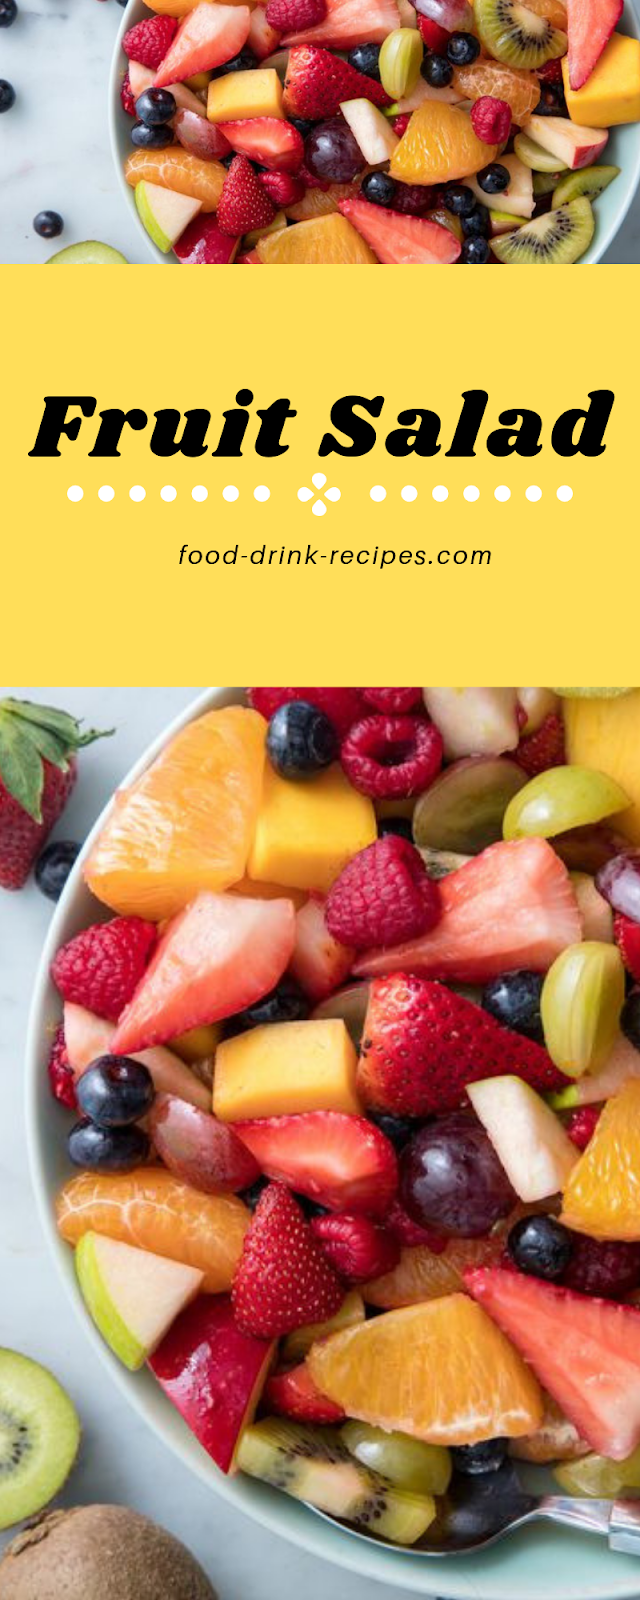 Fruit Salad - food-drink-recipes.com